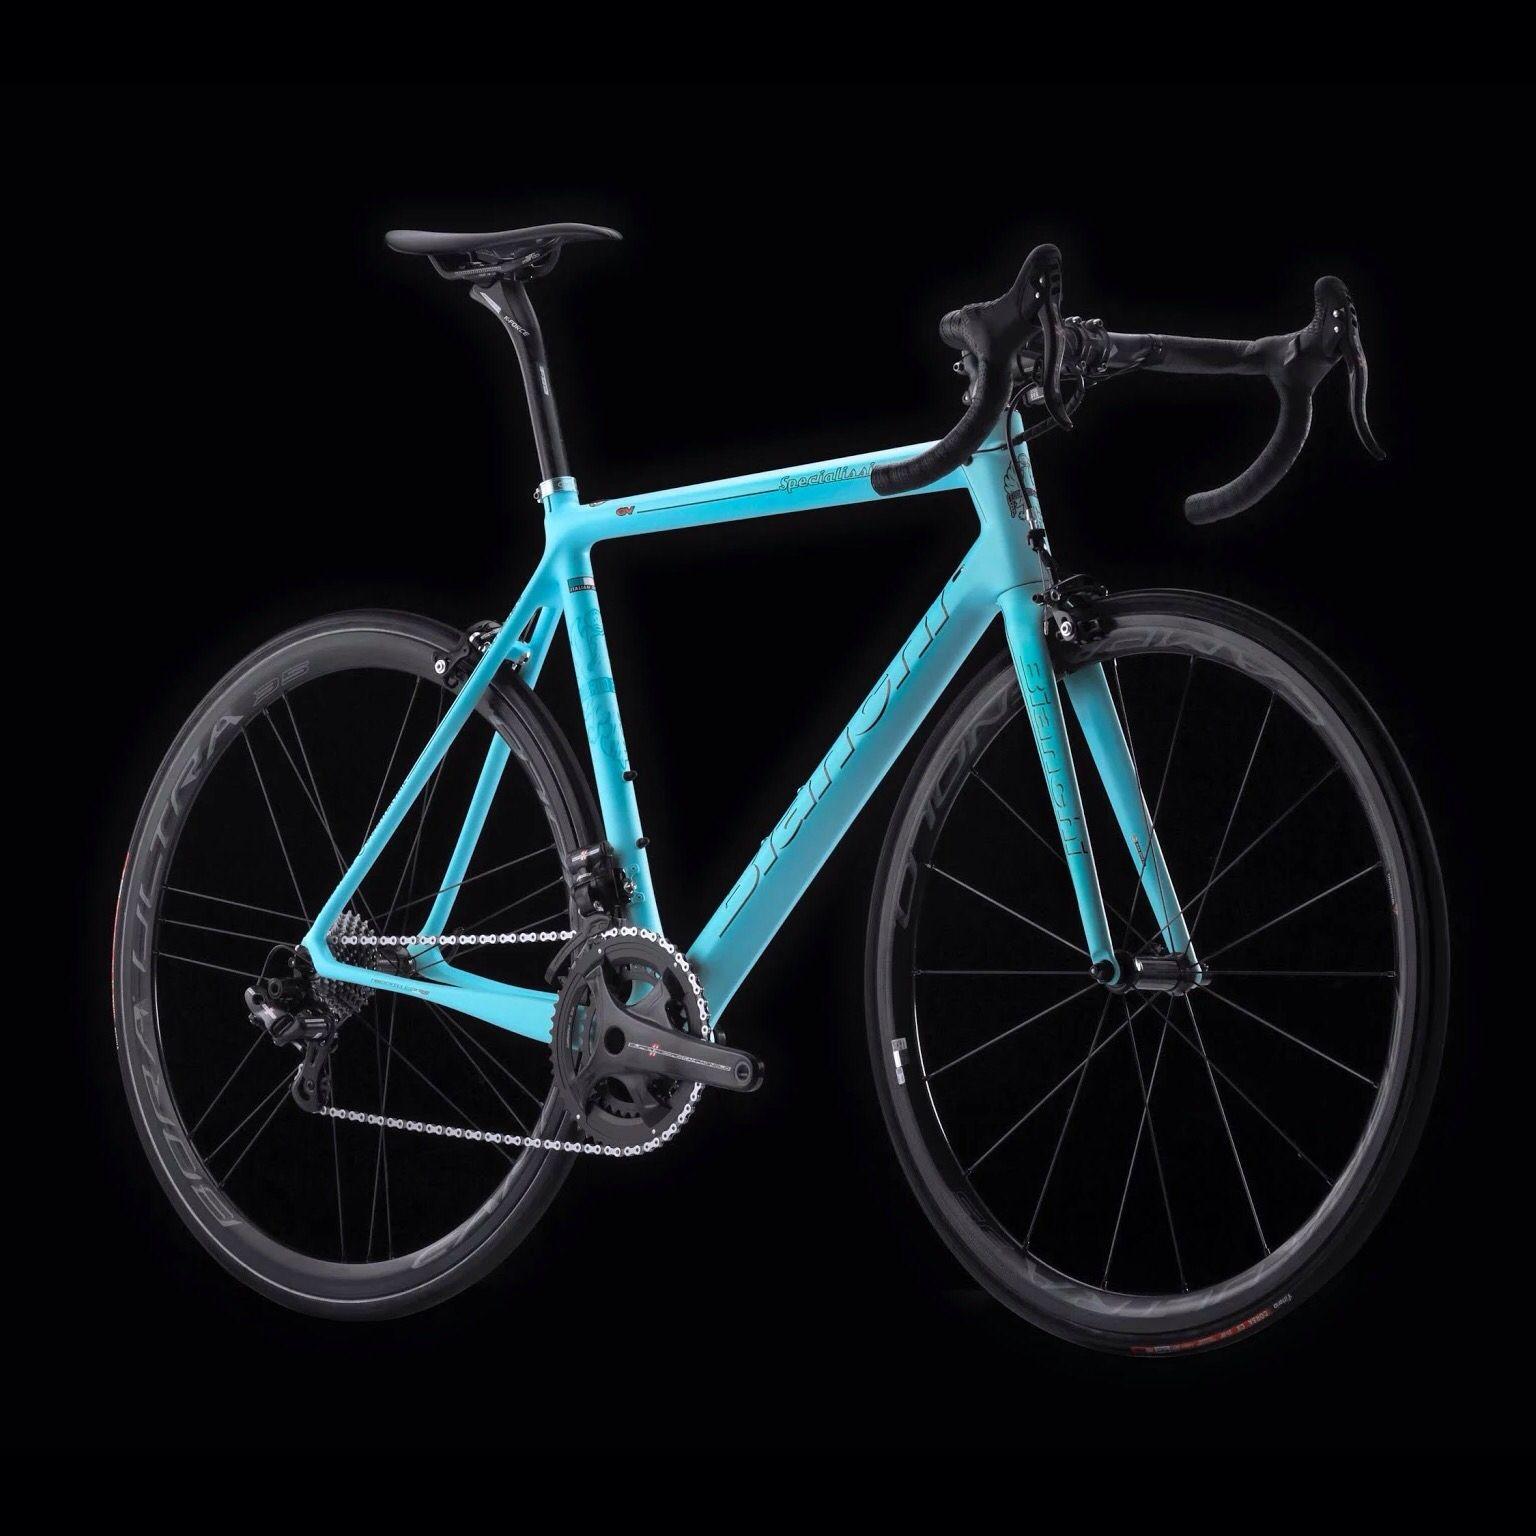 BIANCHI Specialissima Bicycle, Road bikes, Road bike